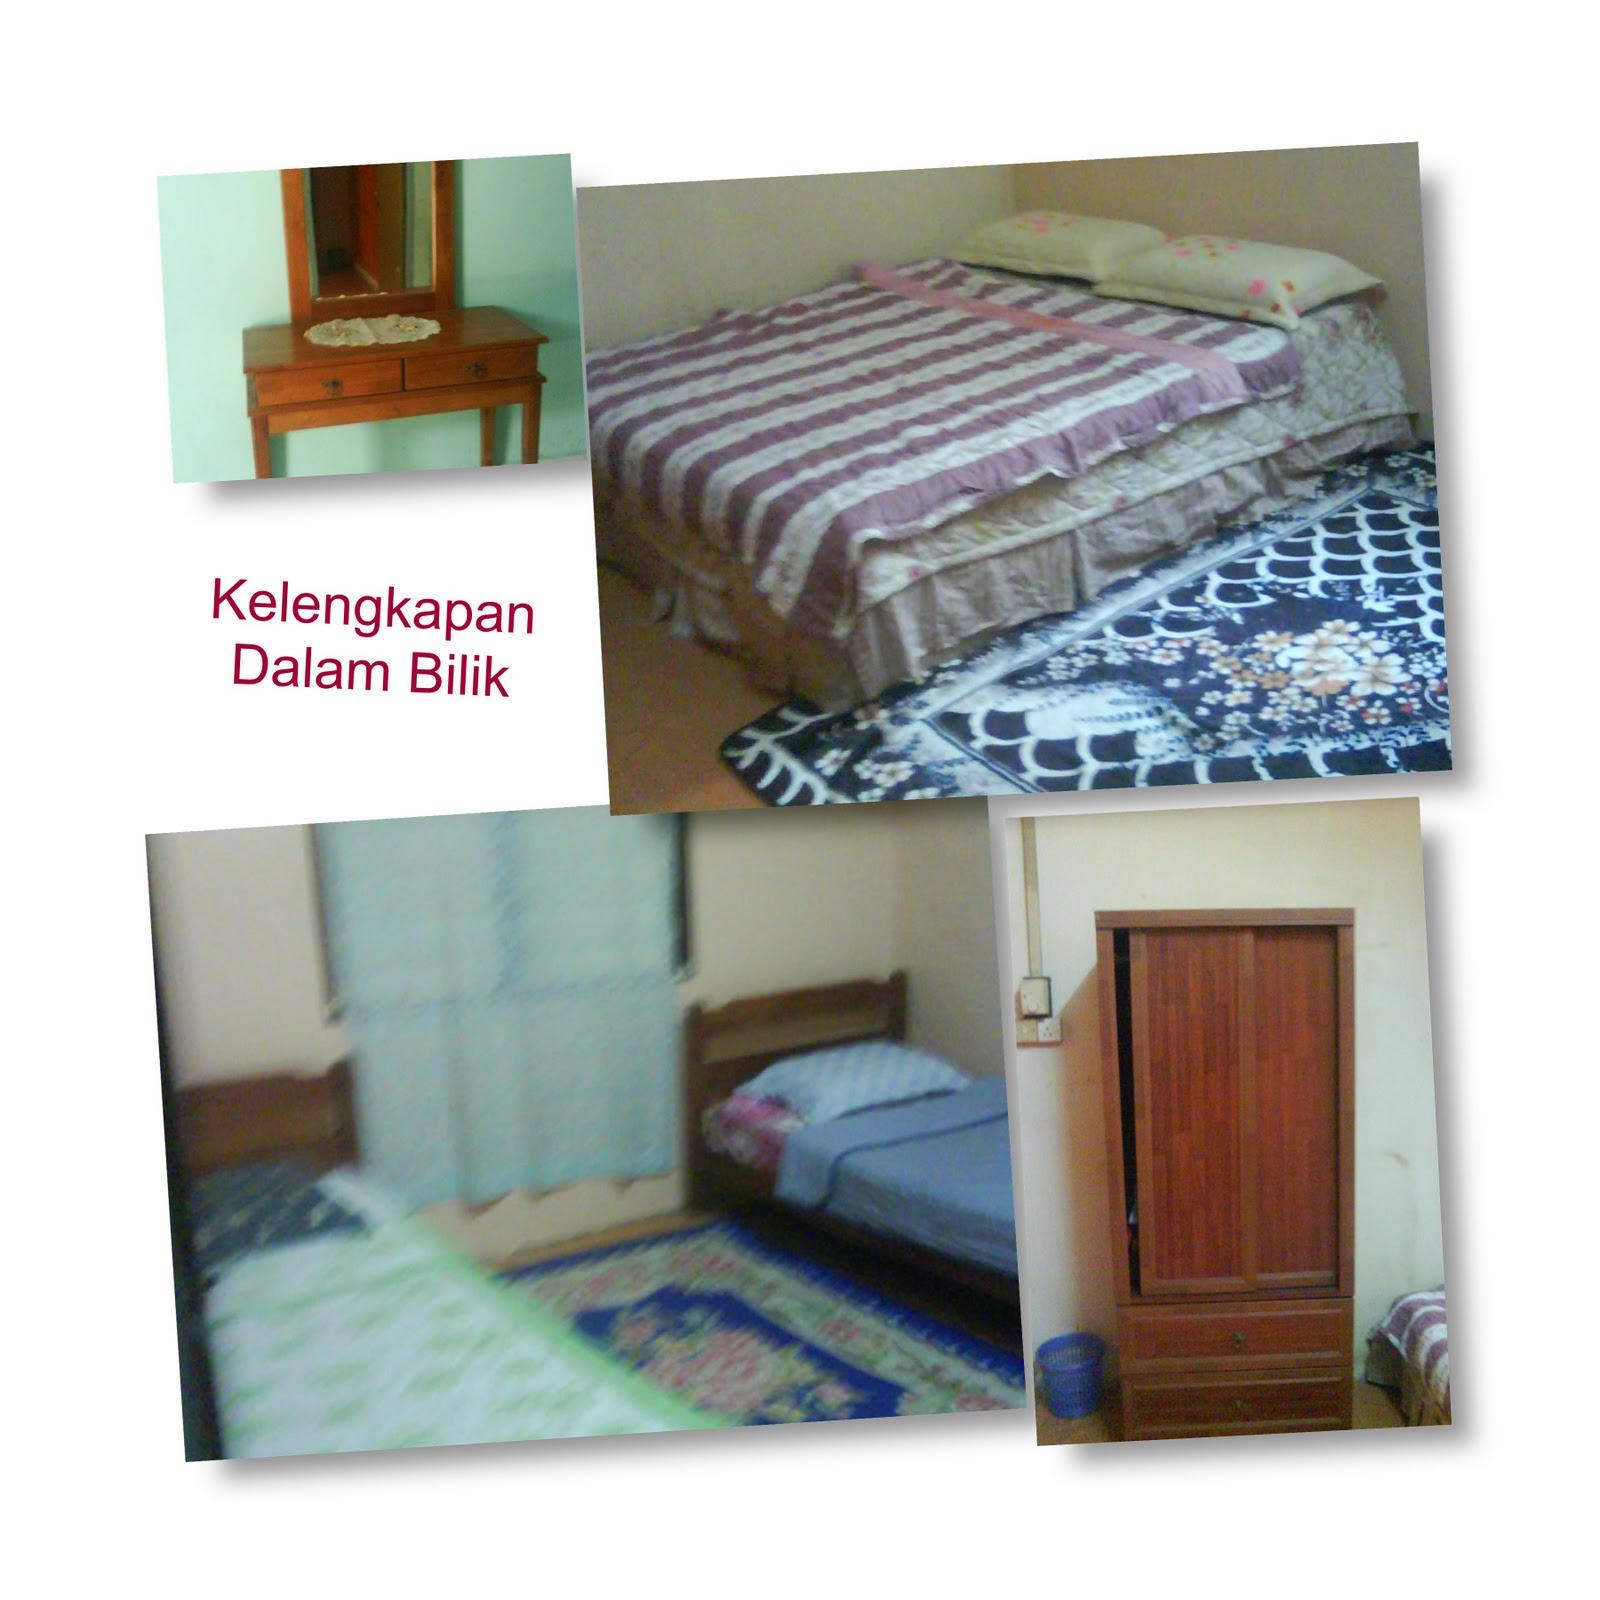 kuala terengganu single men Single storey for rm 140 000 at kuala terengganu, terengganu 0000 sqft 3 bedrooms, 2 bathrooms.